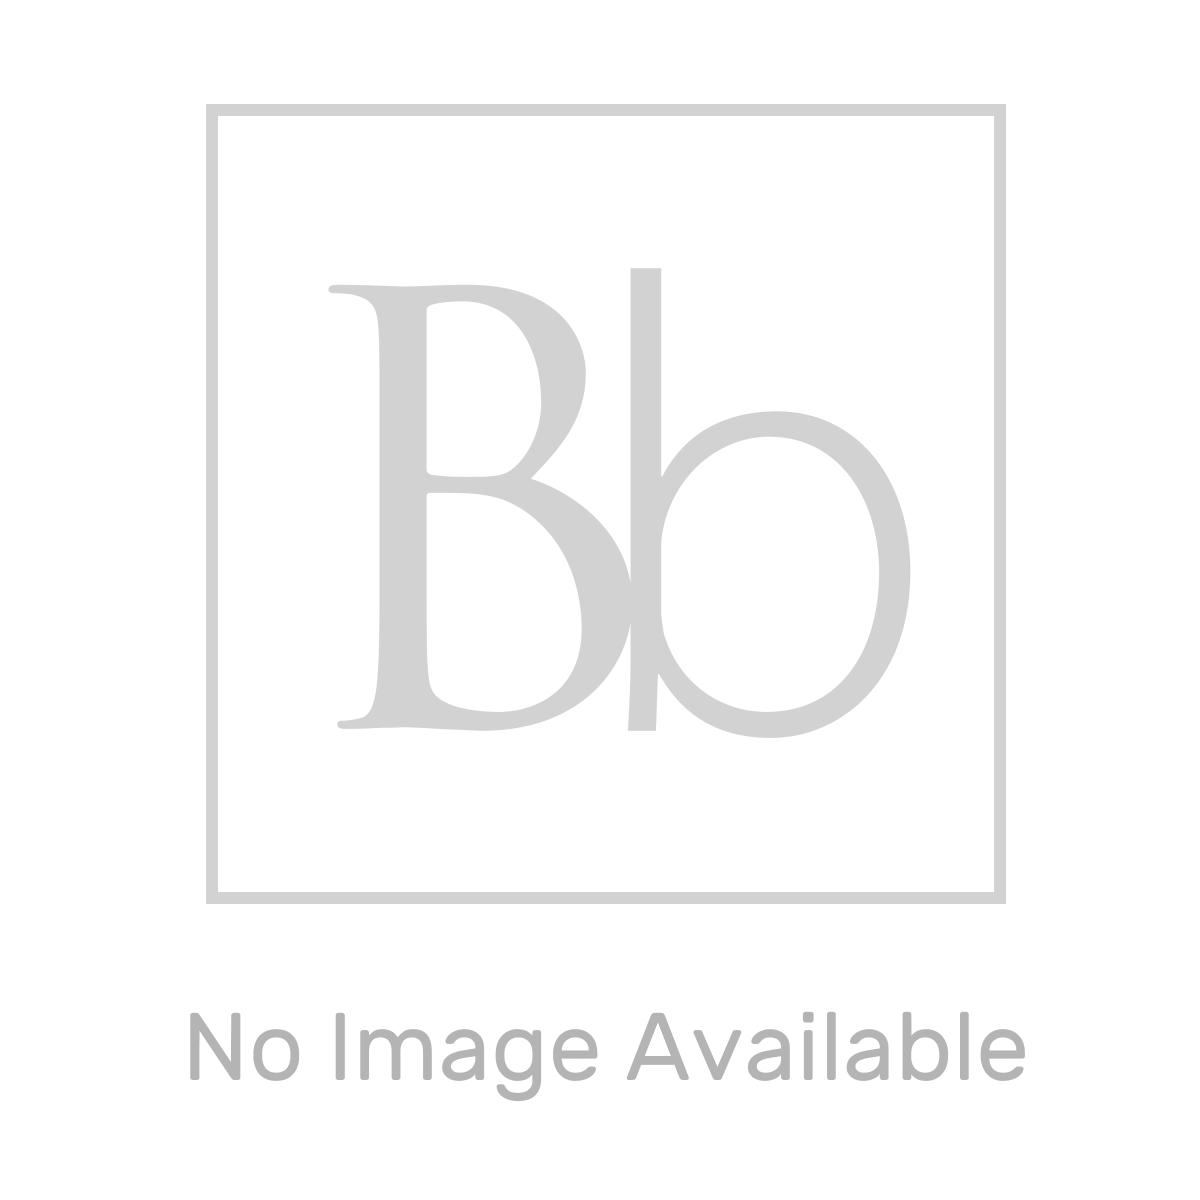 Anti-Slip Tray Cut Through Diagram